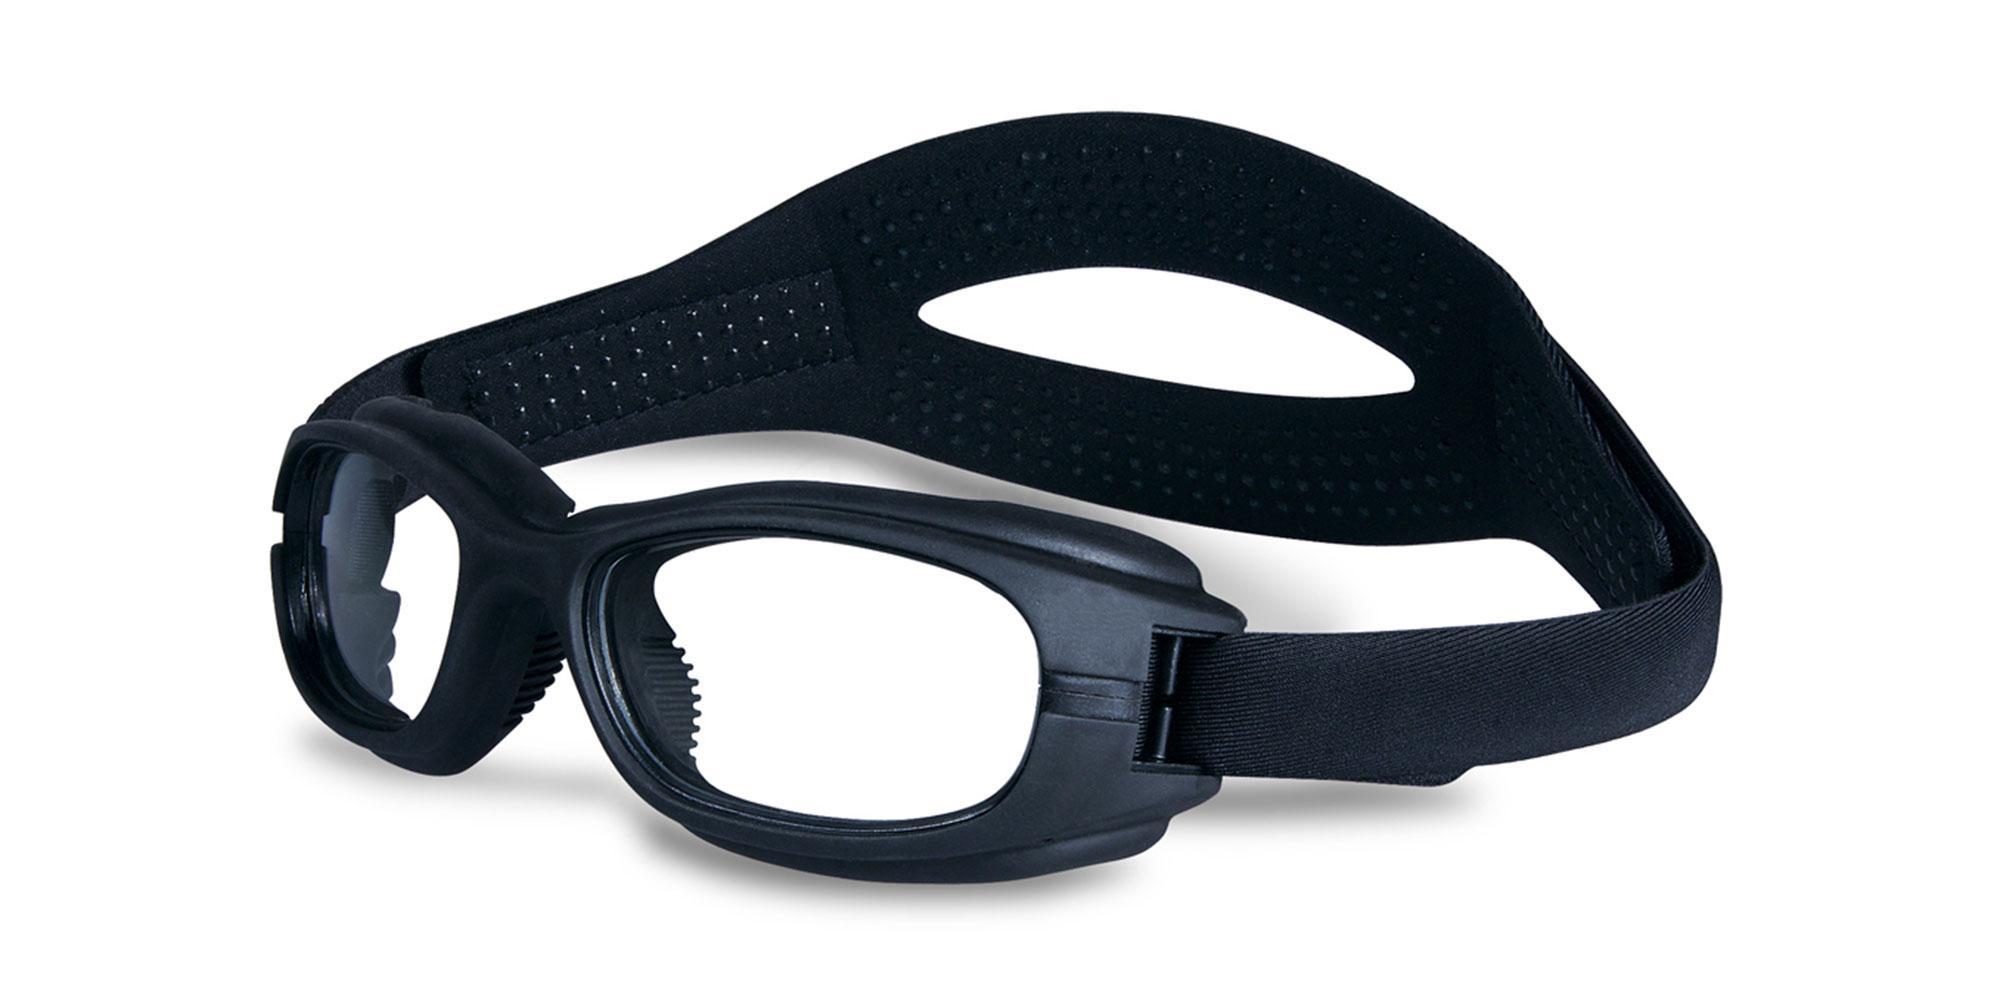 C1 Progear Tackle Accessories, Sports Eyewear